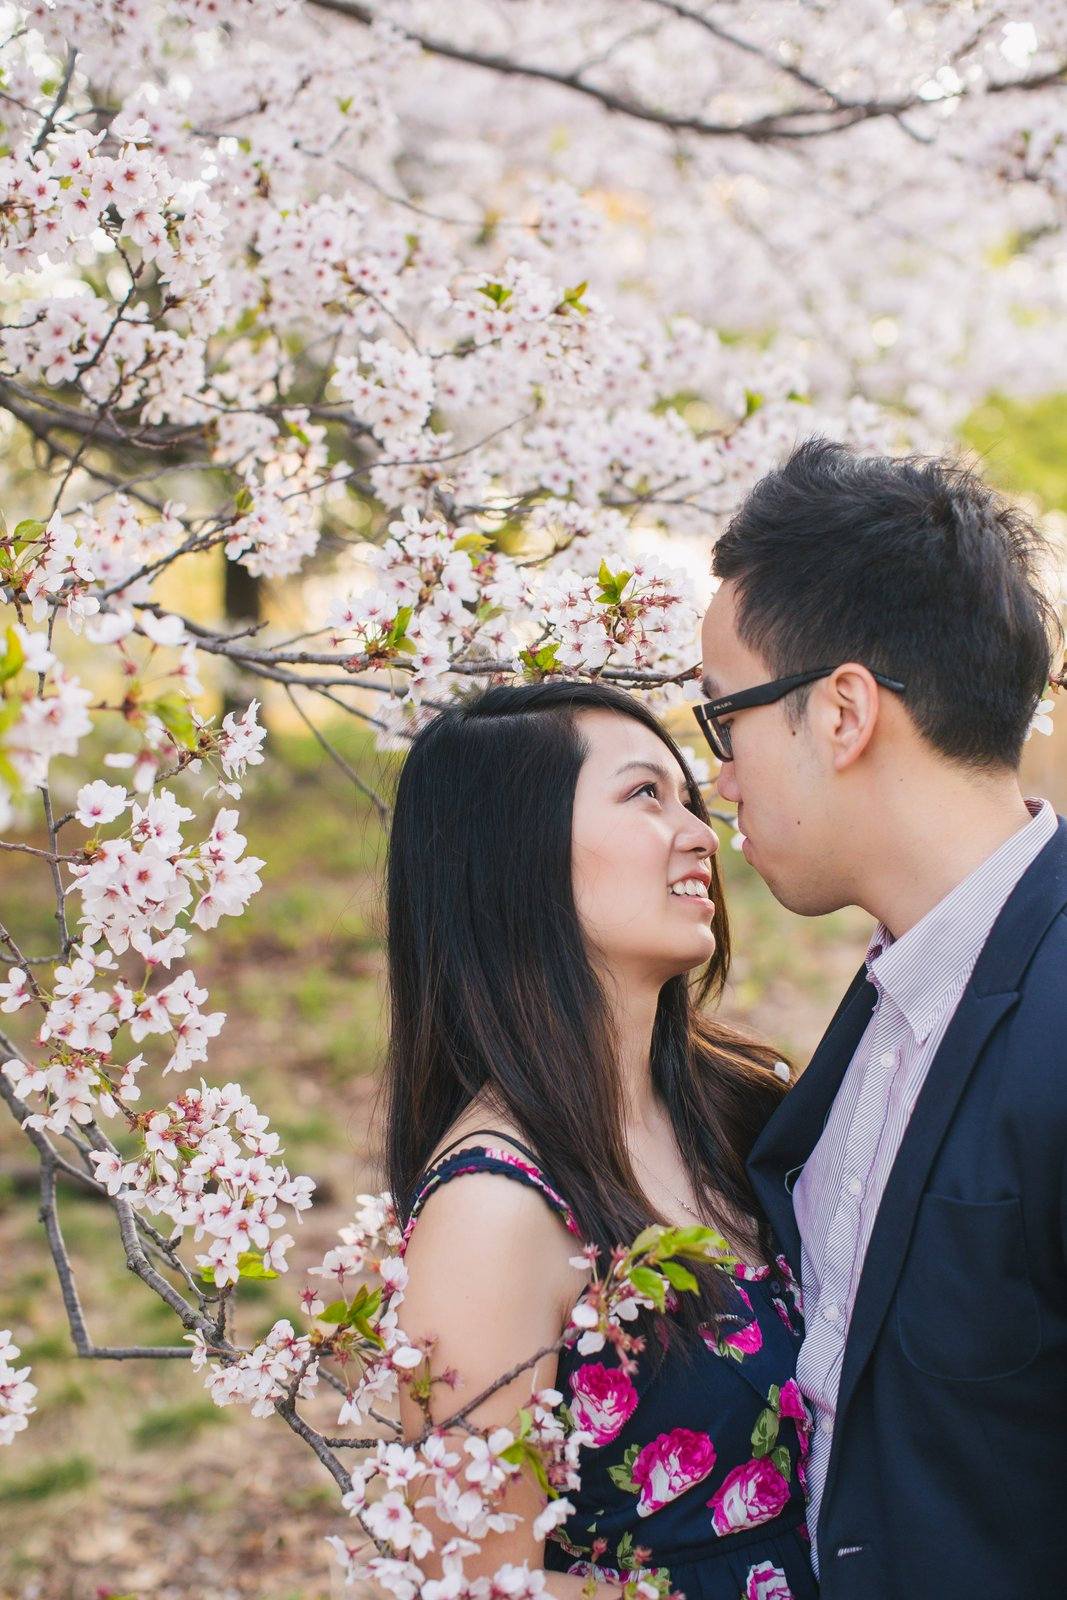 Jessica-Charles-Engagement-High-Park-Cherry-Blossom-013